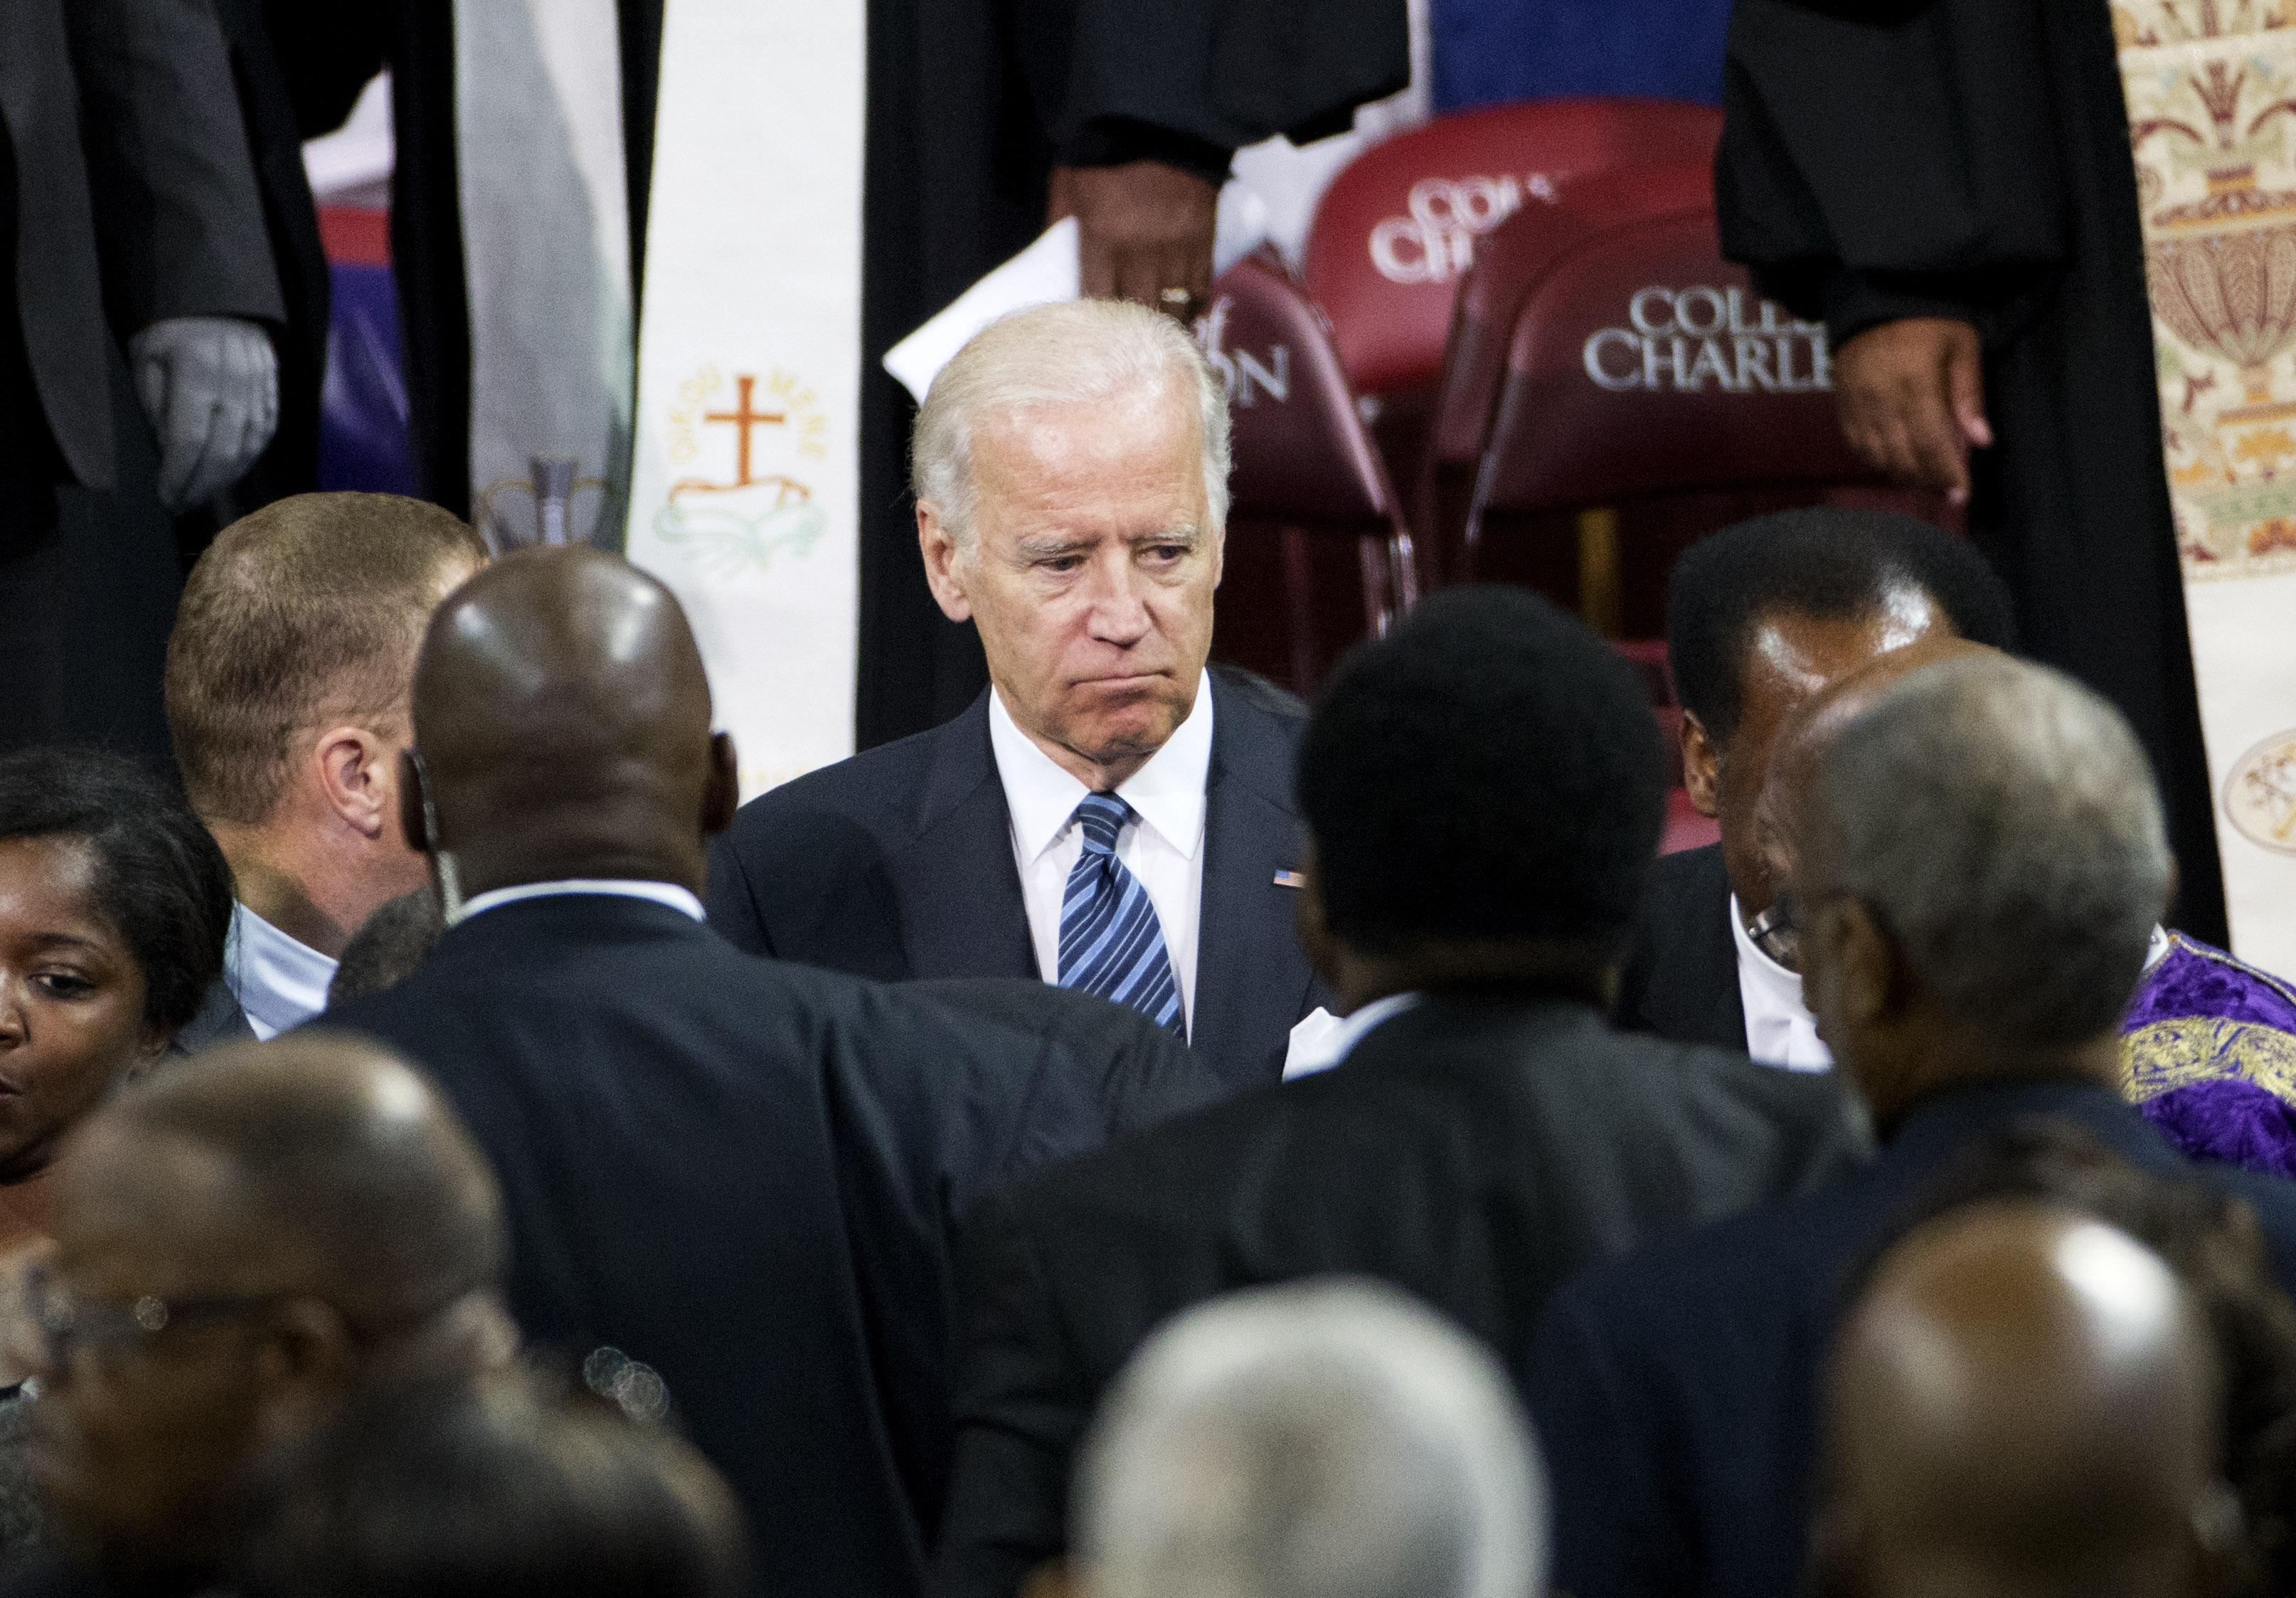 Vice President Joe Biden walks through the crowd at the funeral service for Rev. Clementa Pinckney on June 26, 2015, in Charleston, S.C. (David Goldman/AP)